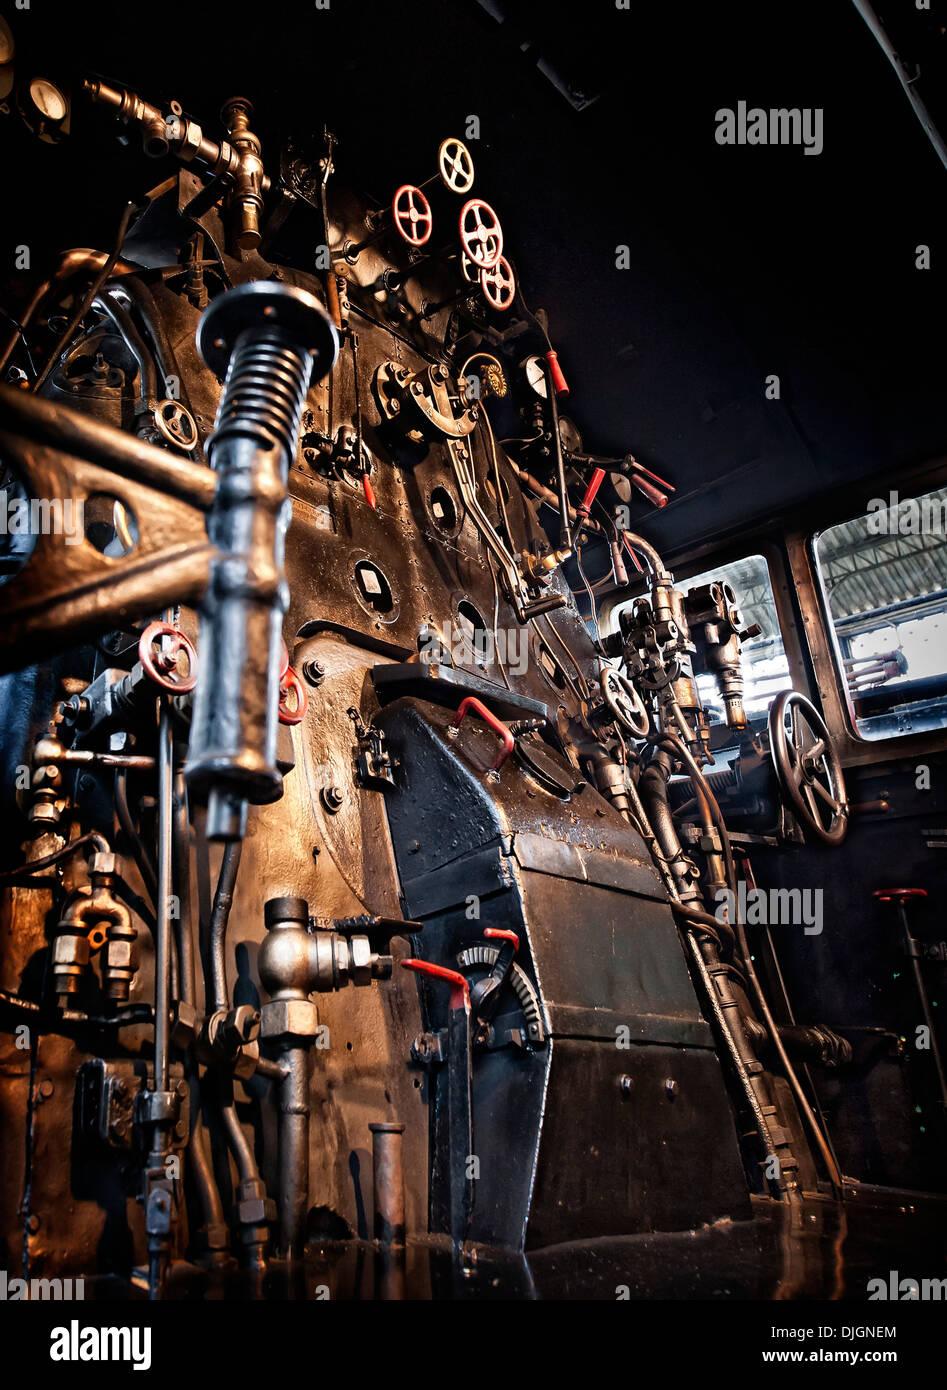 Locomotive steam gauges - Stock Image